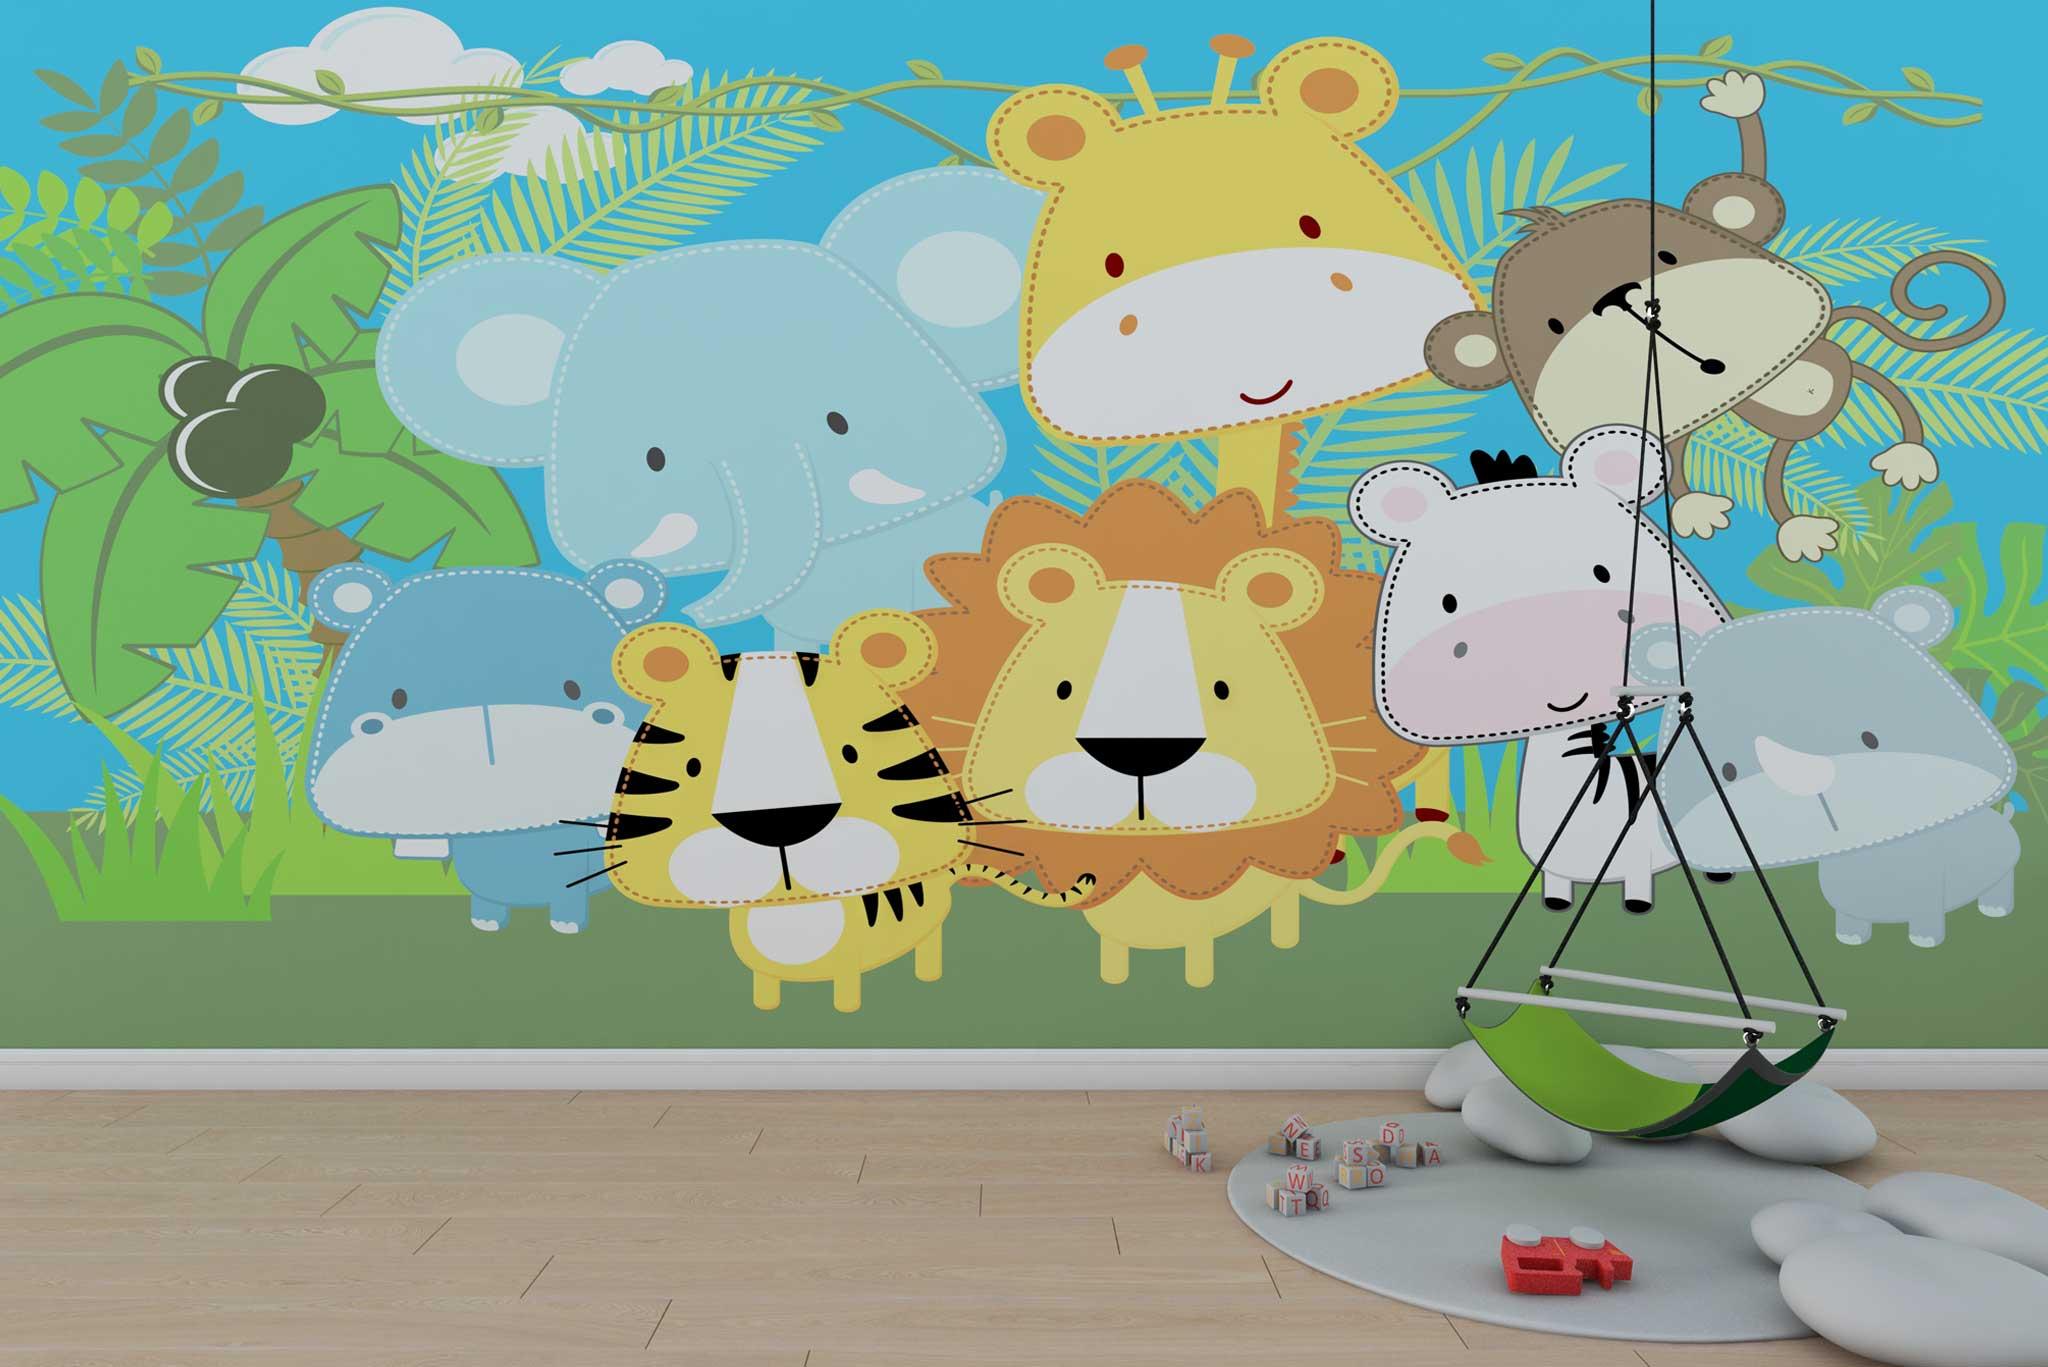 tapet-fototapet-design-personalizat-customizabil-comanda-special-camera-dormitor-copii-model-animale-jungla-prieteni-desen-multicolor